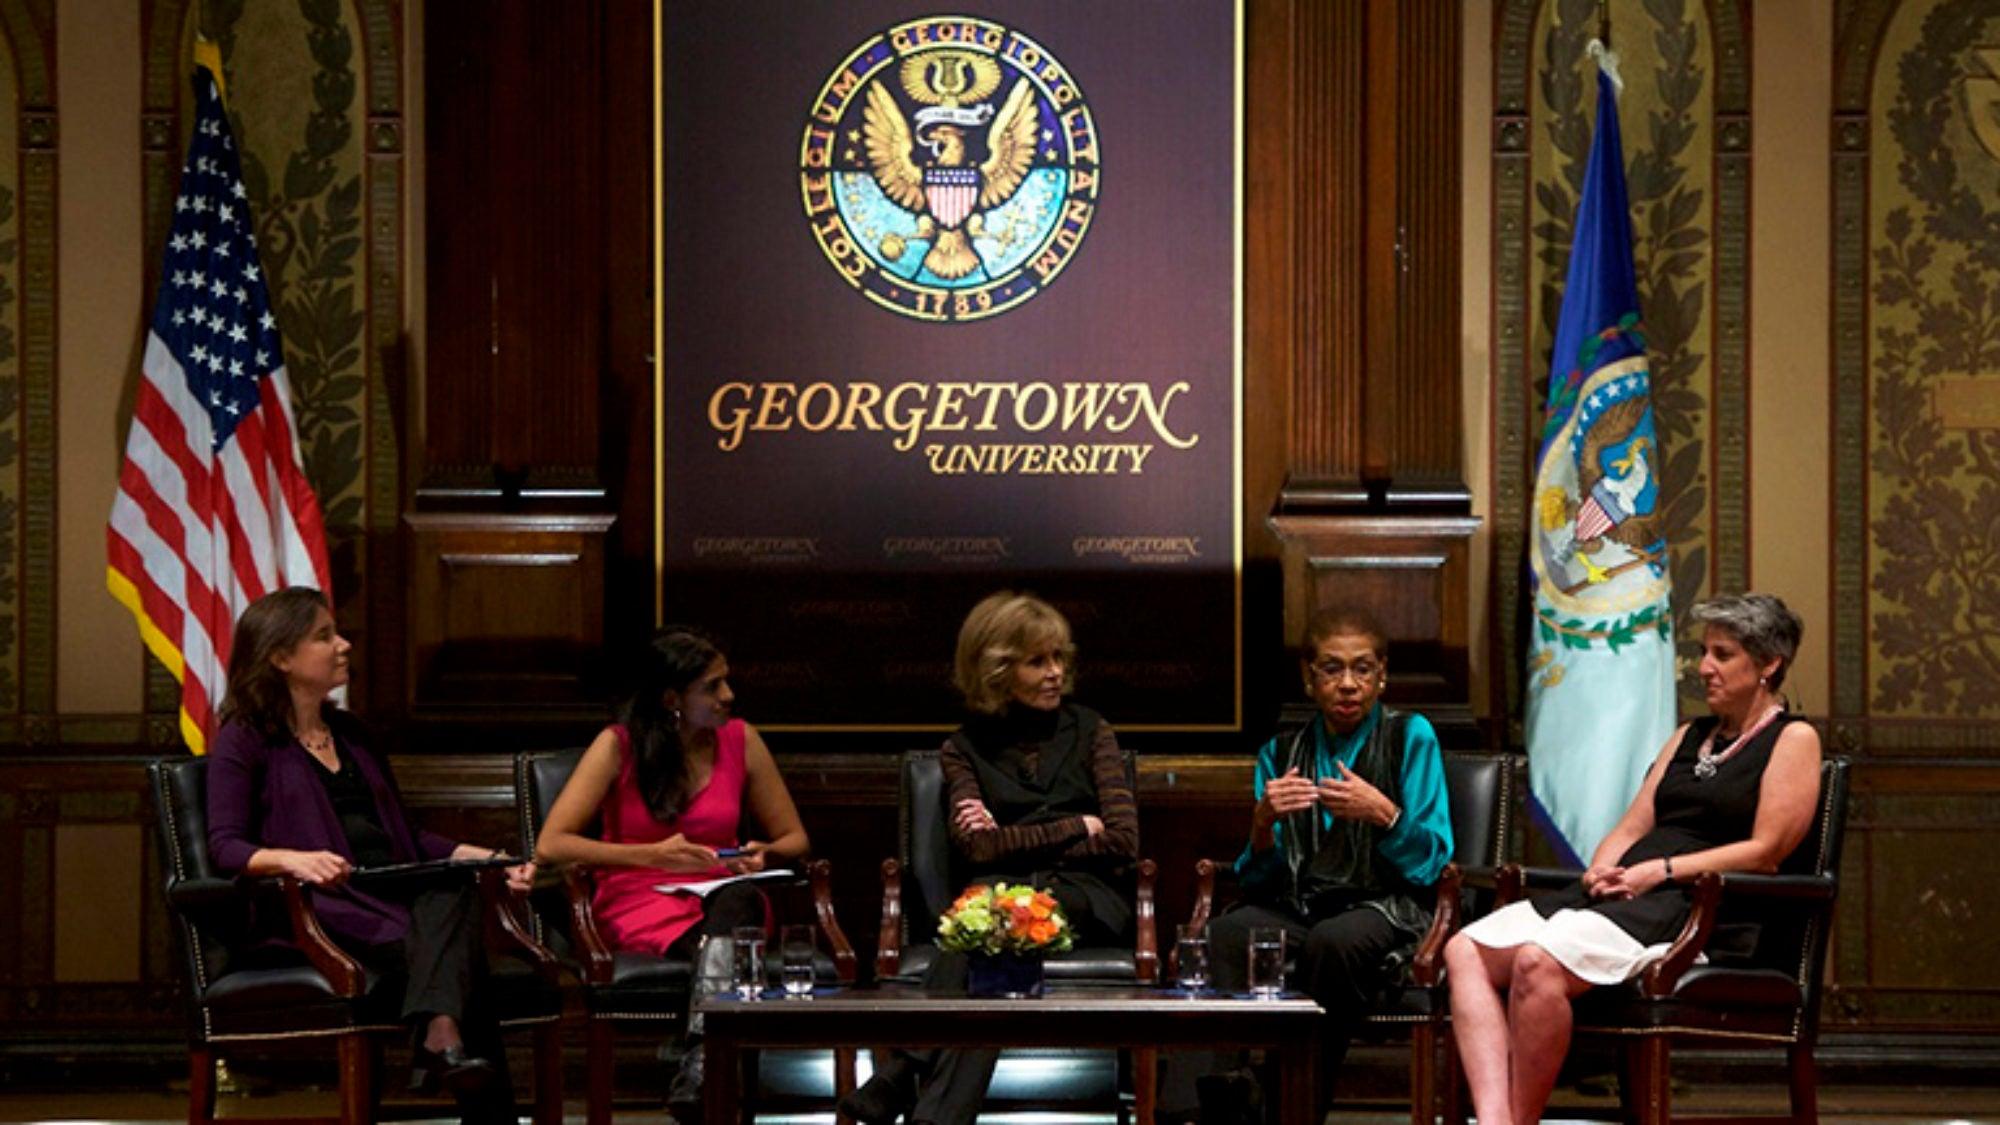 Lane Windham, Saru Jayaraman, Jane Fonda, Eleanor Holmes-Norton and Elissa Silverman on stage in Gaston Hall